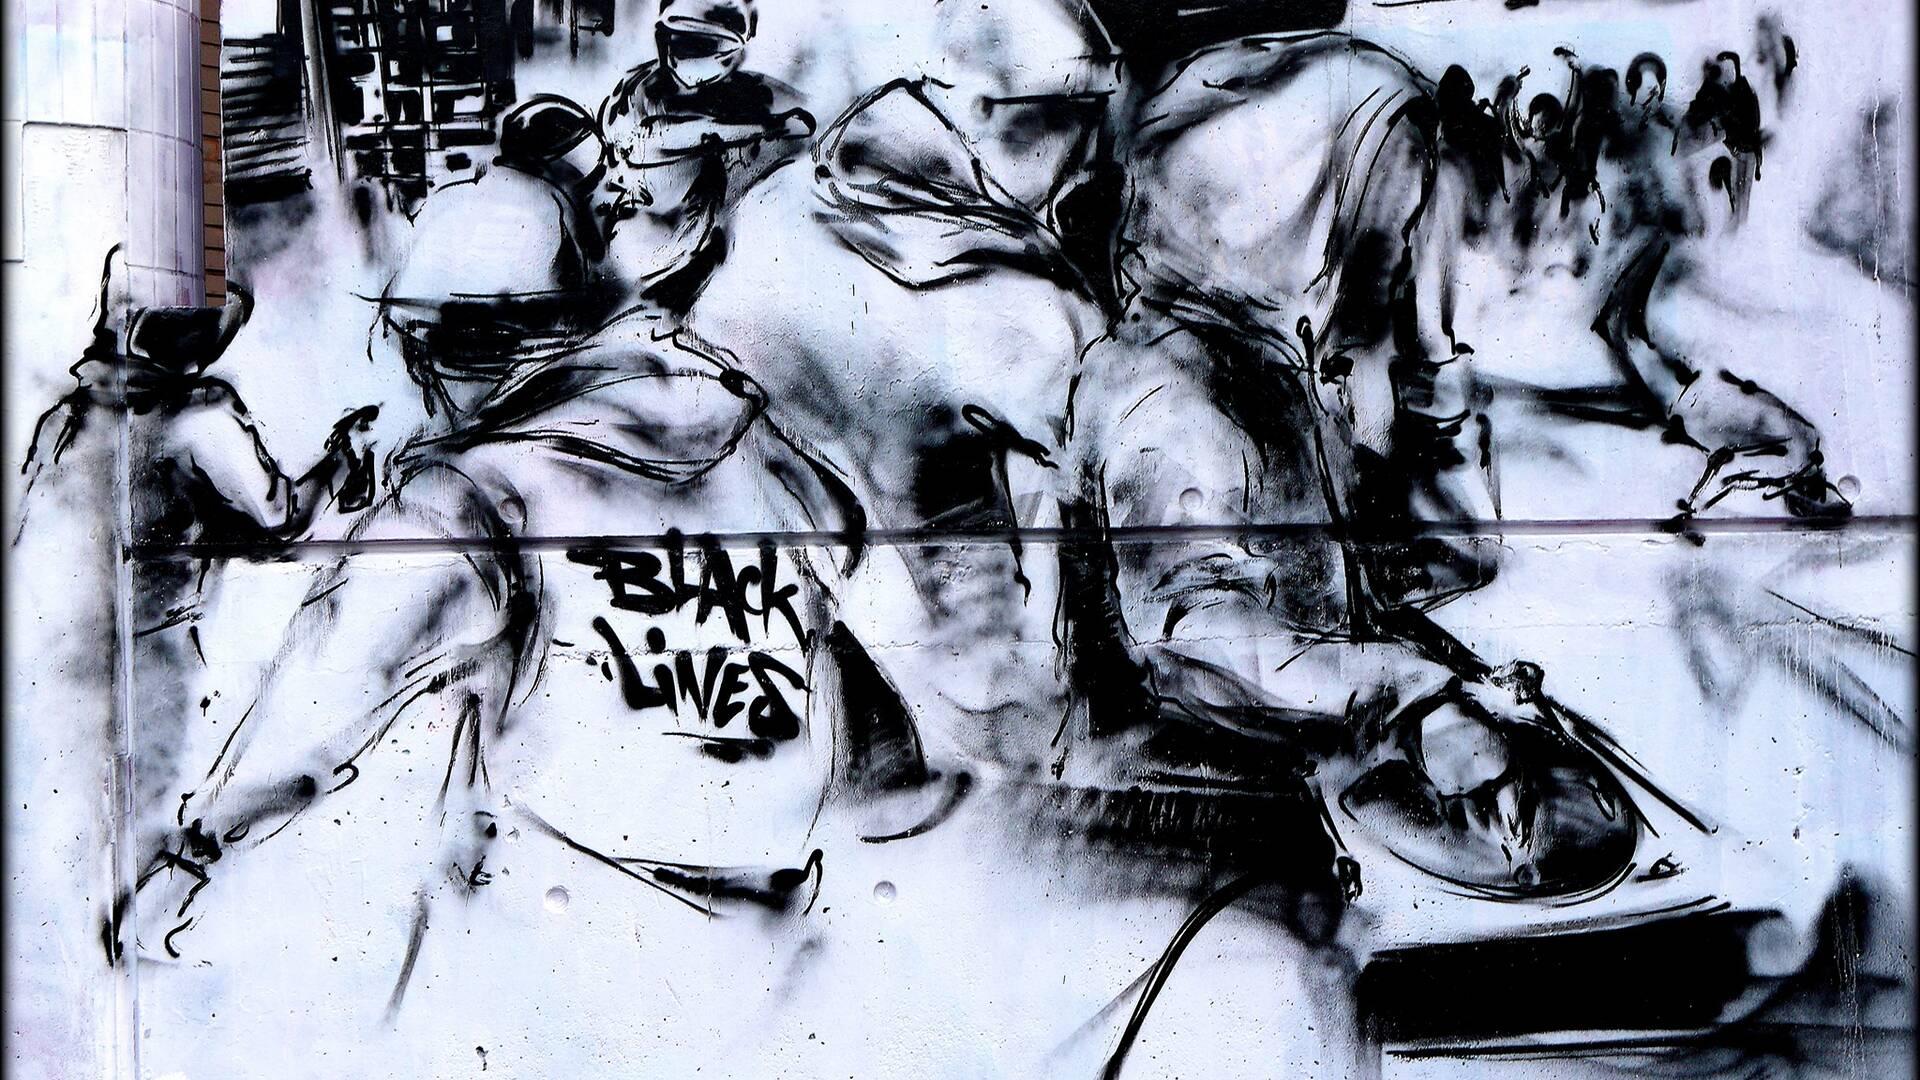 black-lines-mur-93-street-art-art-urbain